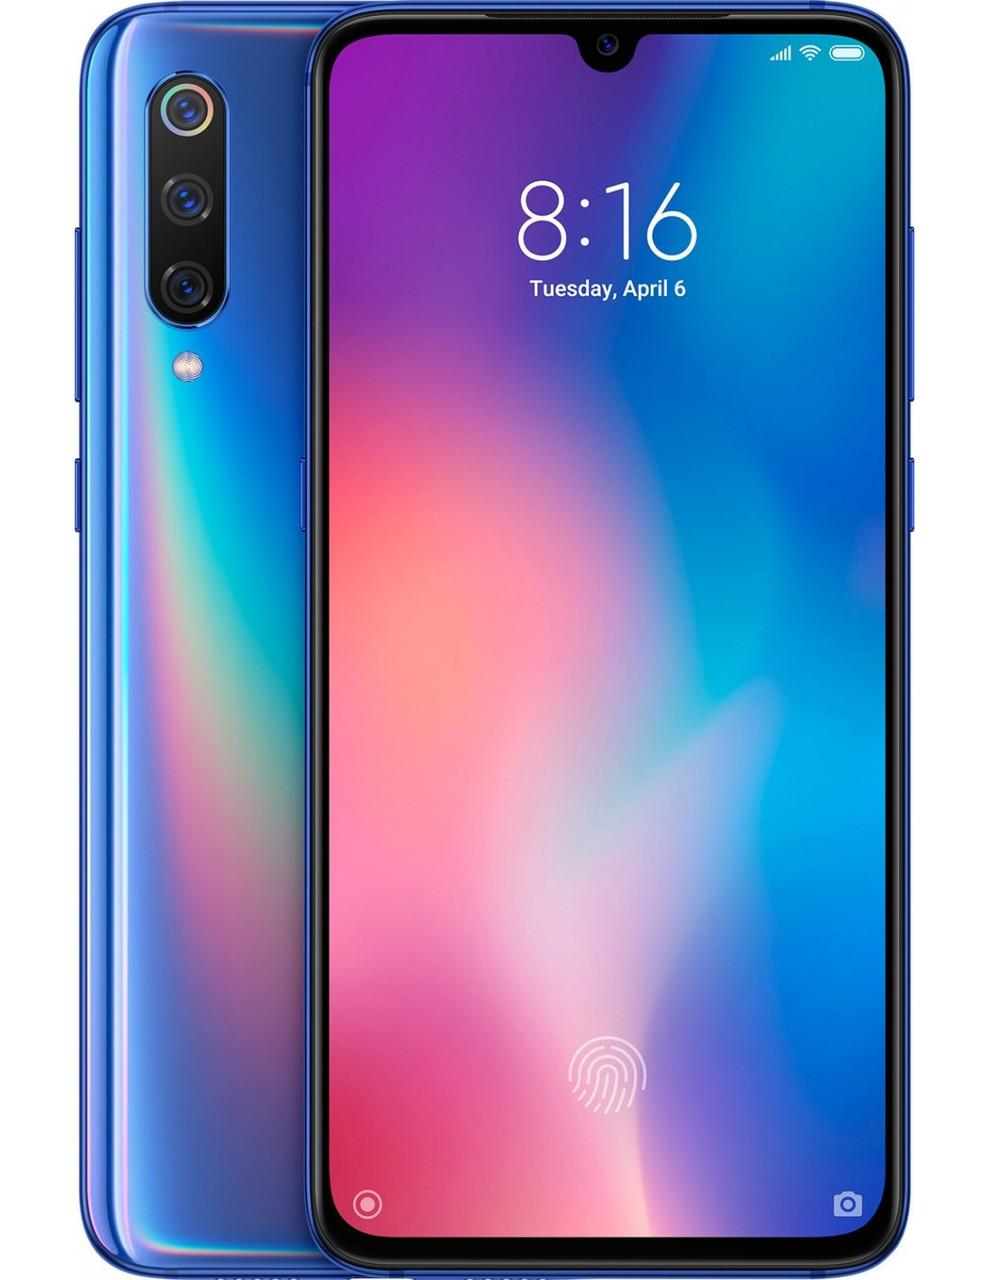 Смартфон Xiaomi Mi 9 6/128 Blue [Global] (M1902F1G) EAN/UPC: 6941059619437